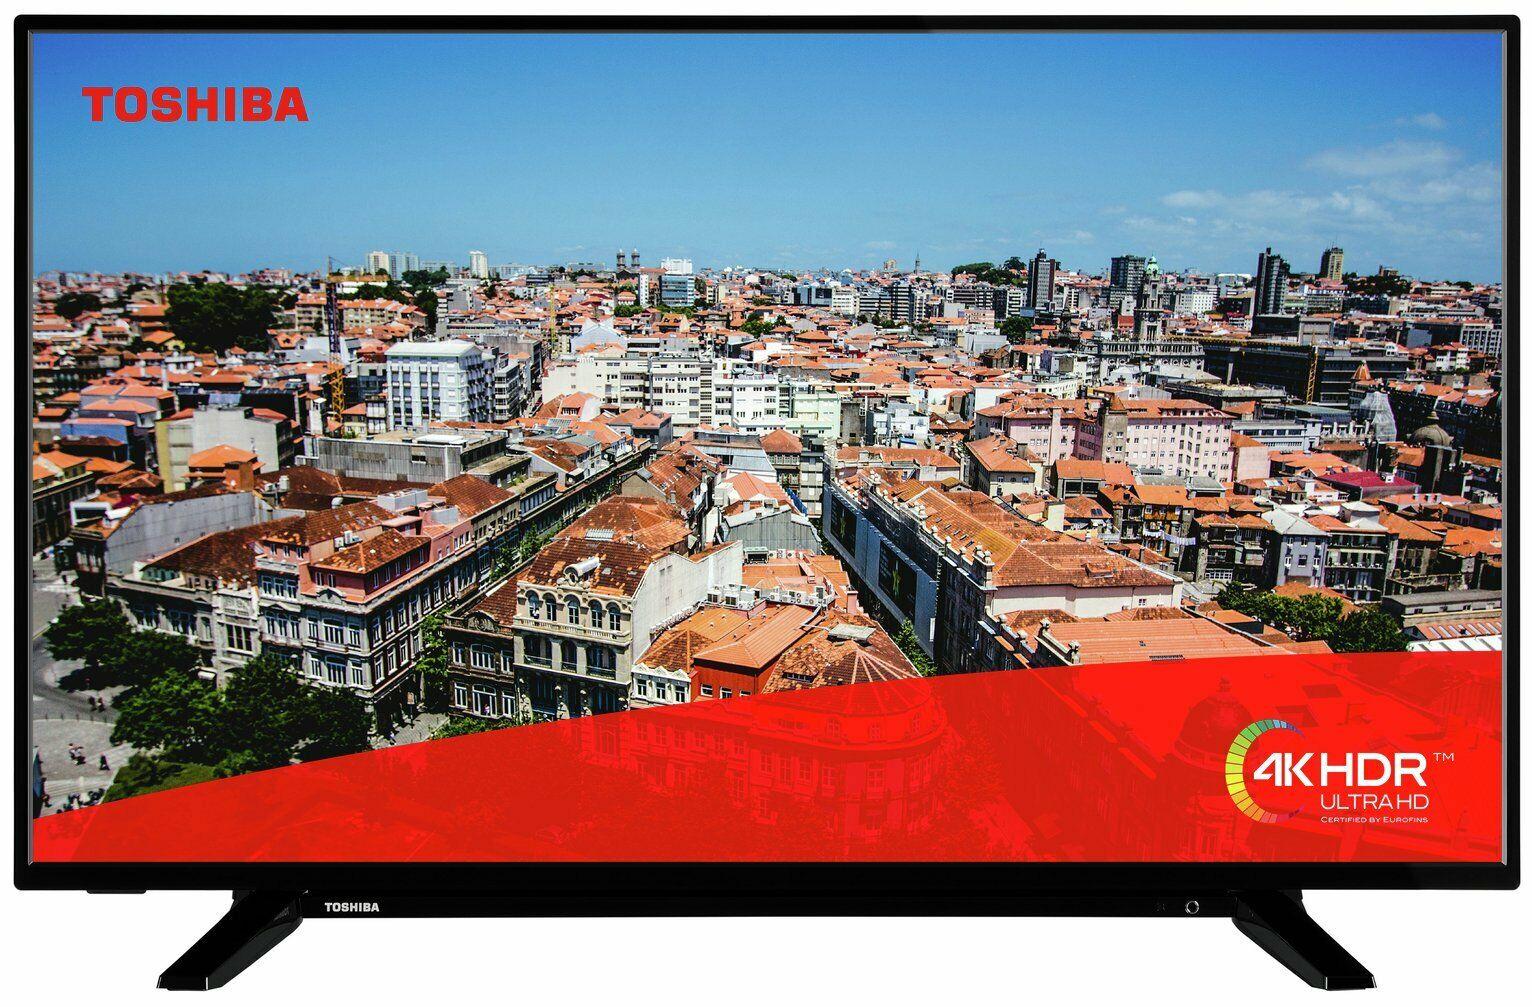 Toshiba 43U2963DB 43 Inch 4K Ultra HD Smart WiFi LED TV - Black £279 in Asda Bournemouth